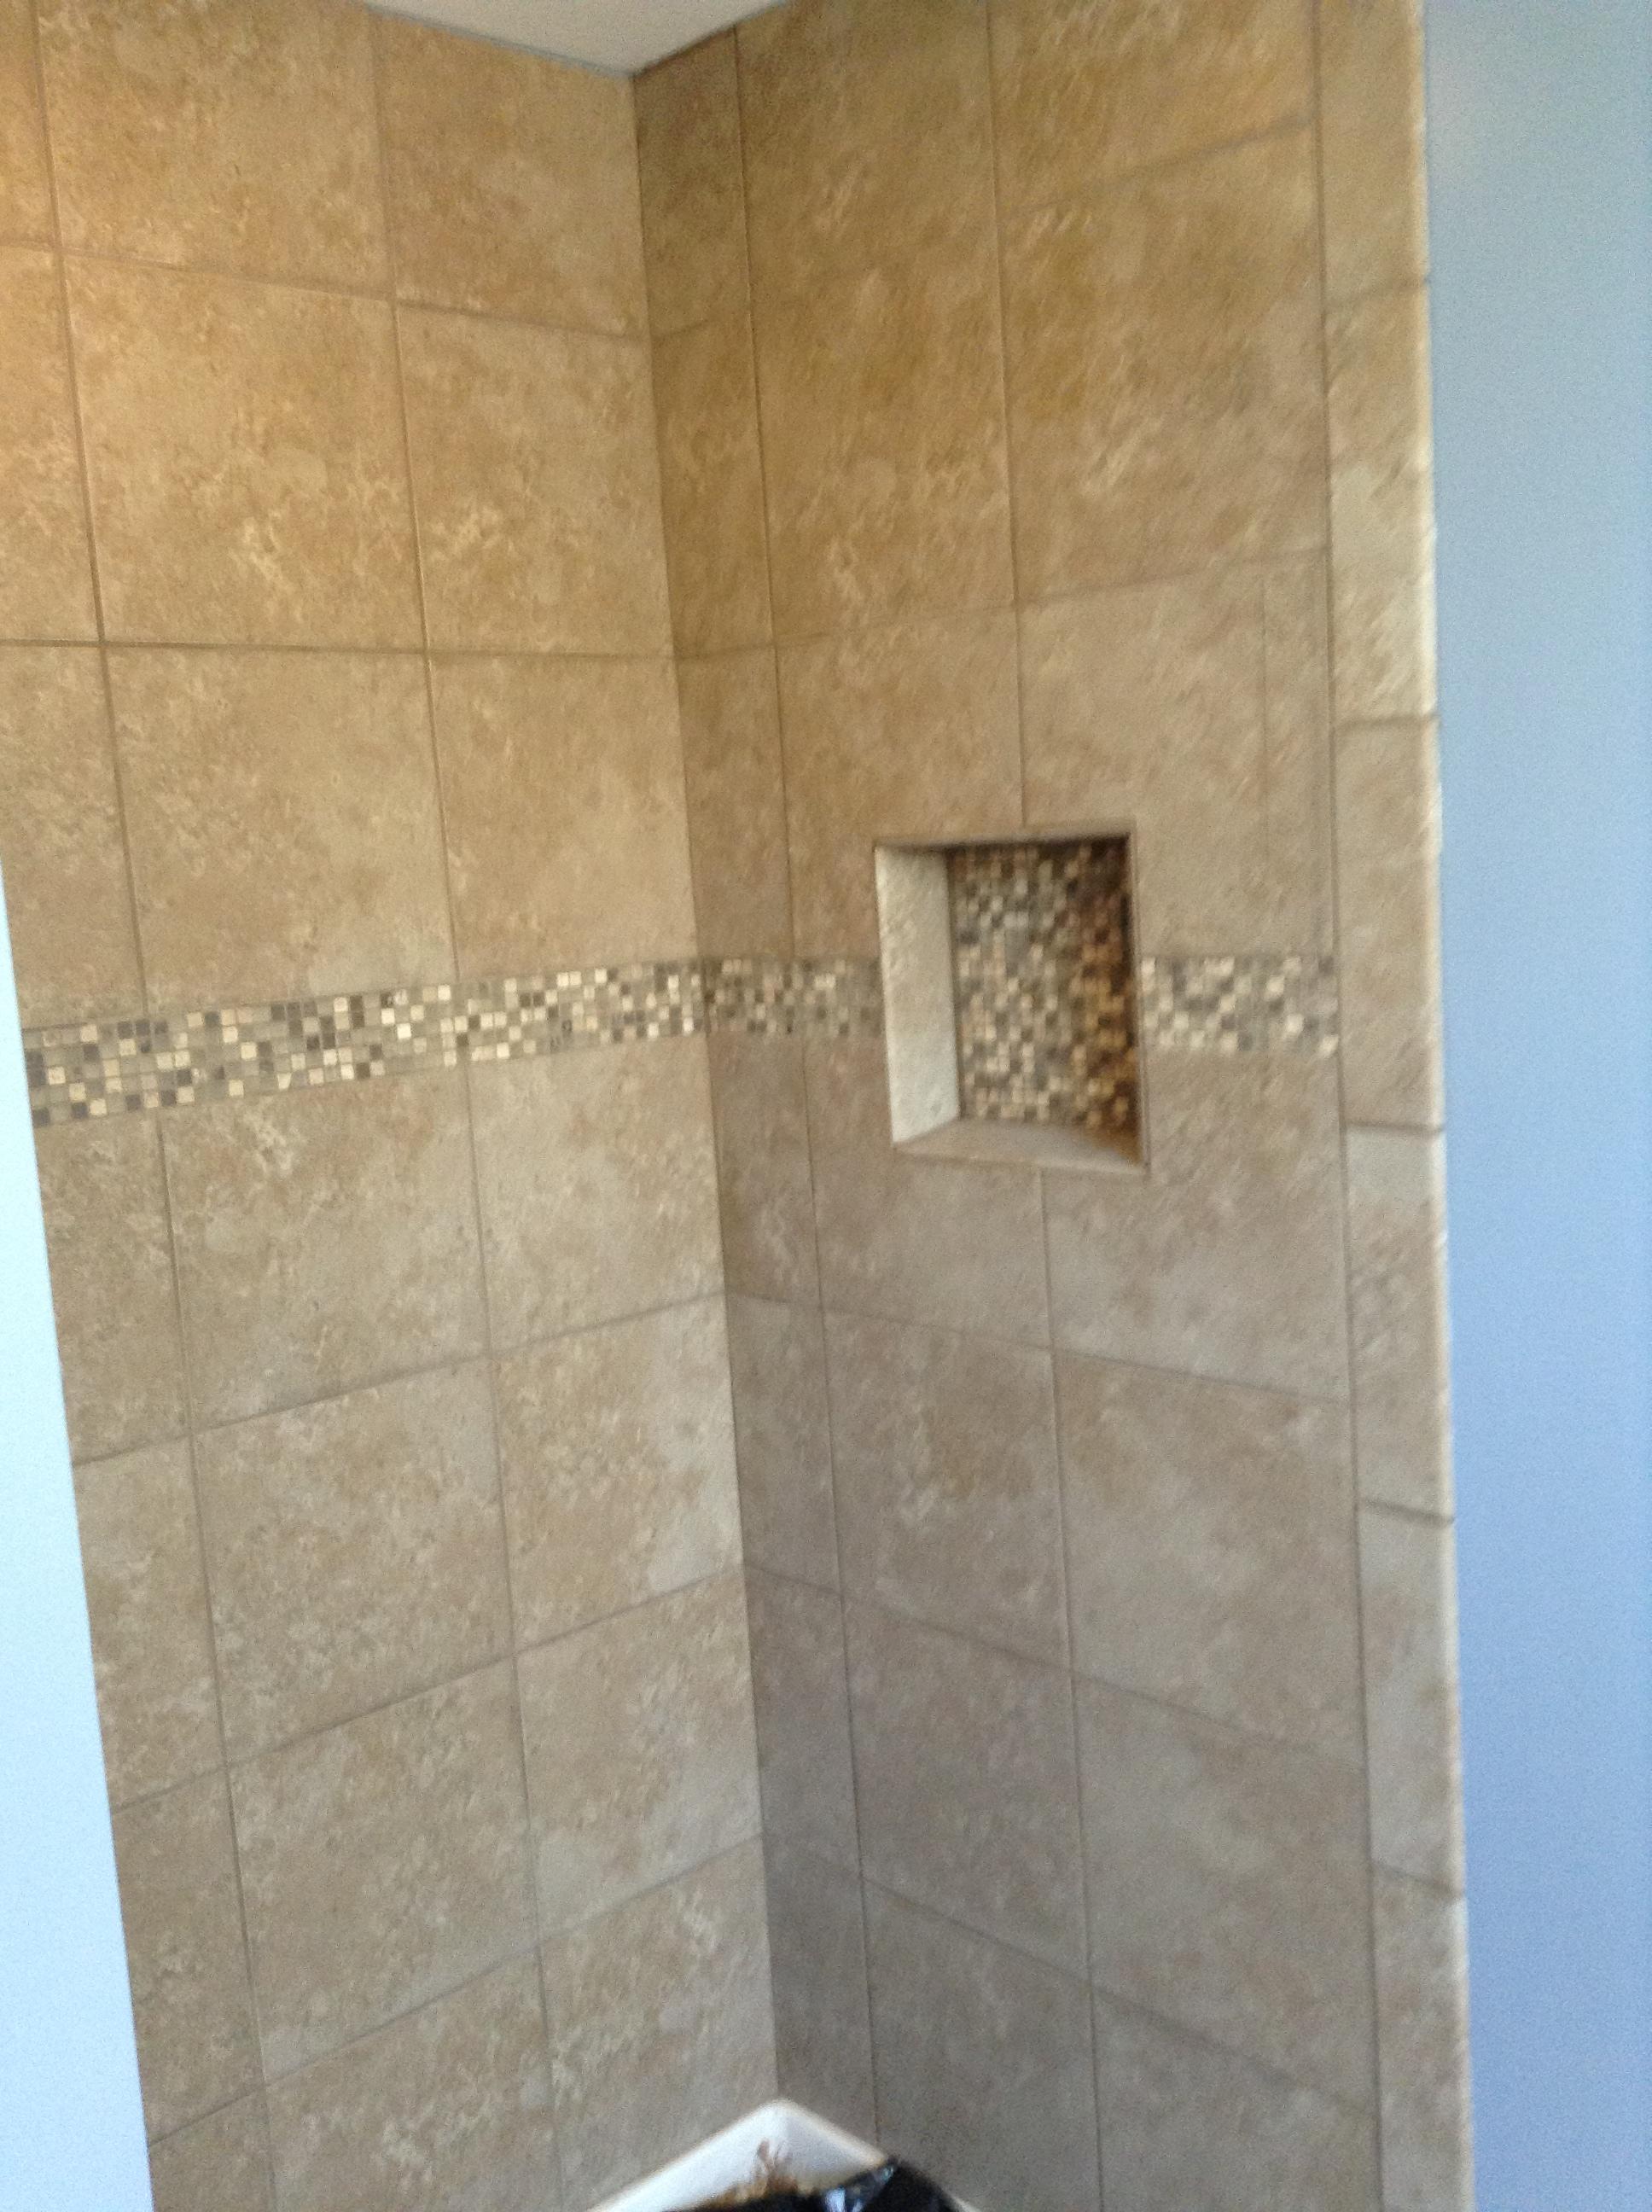 Finished shower w/shanpoo shelf